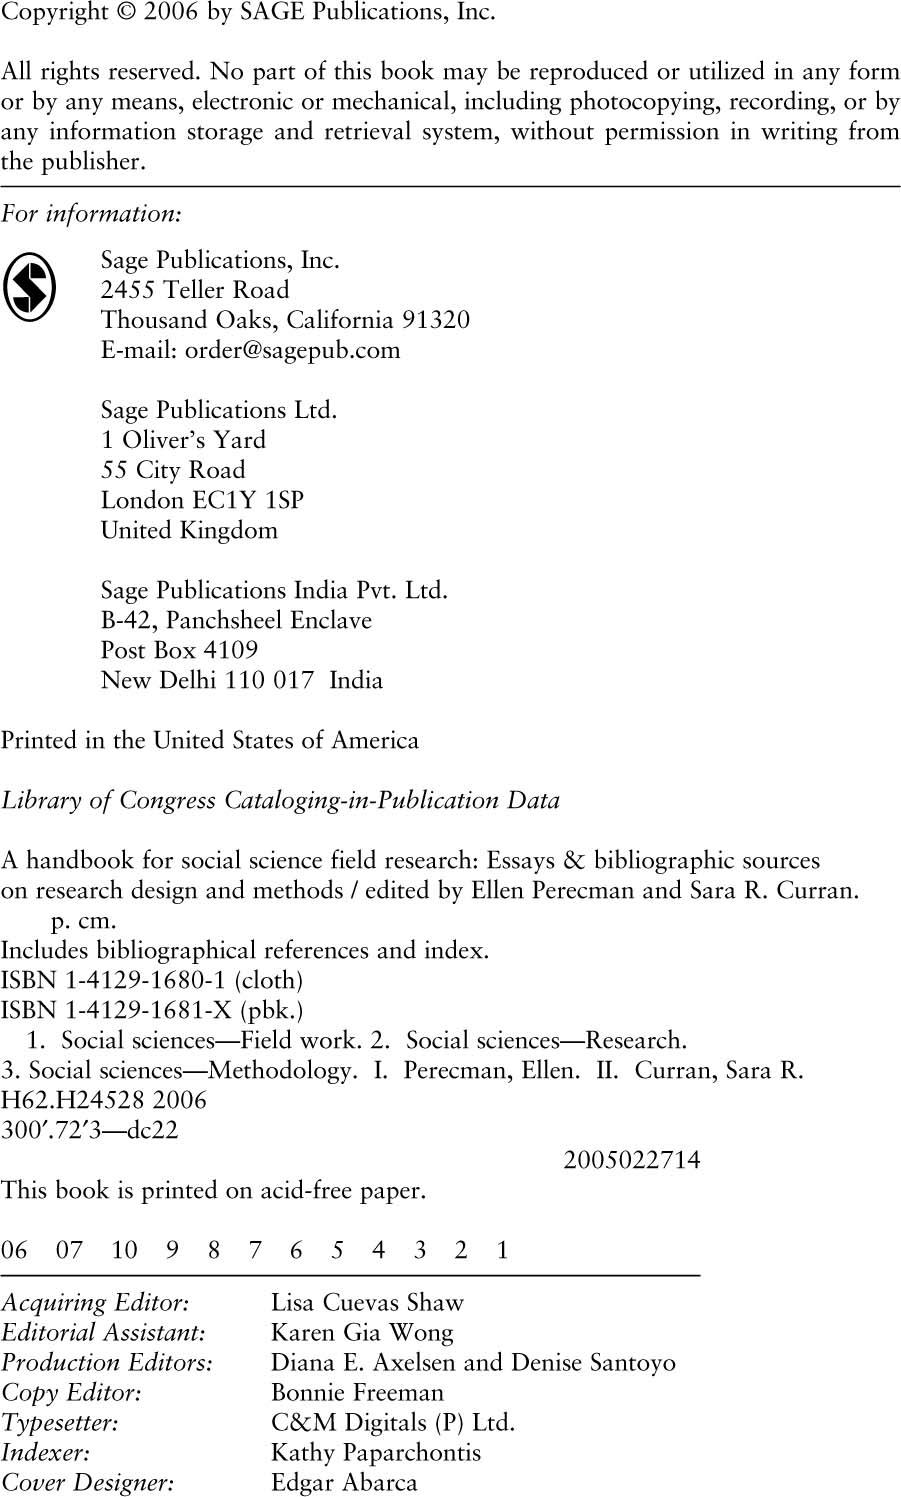 013 Essay On Importance Of Social Science Copy Rare Full